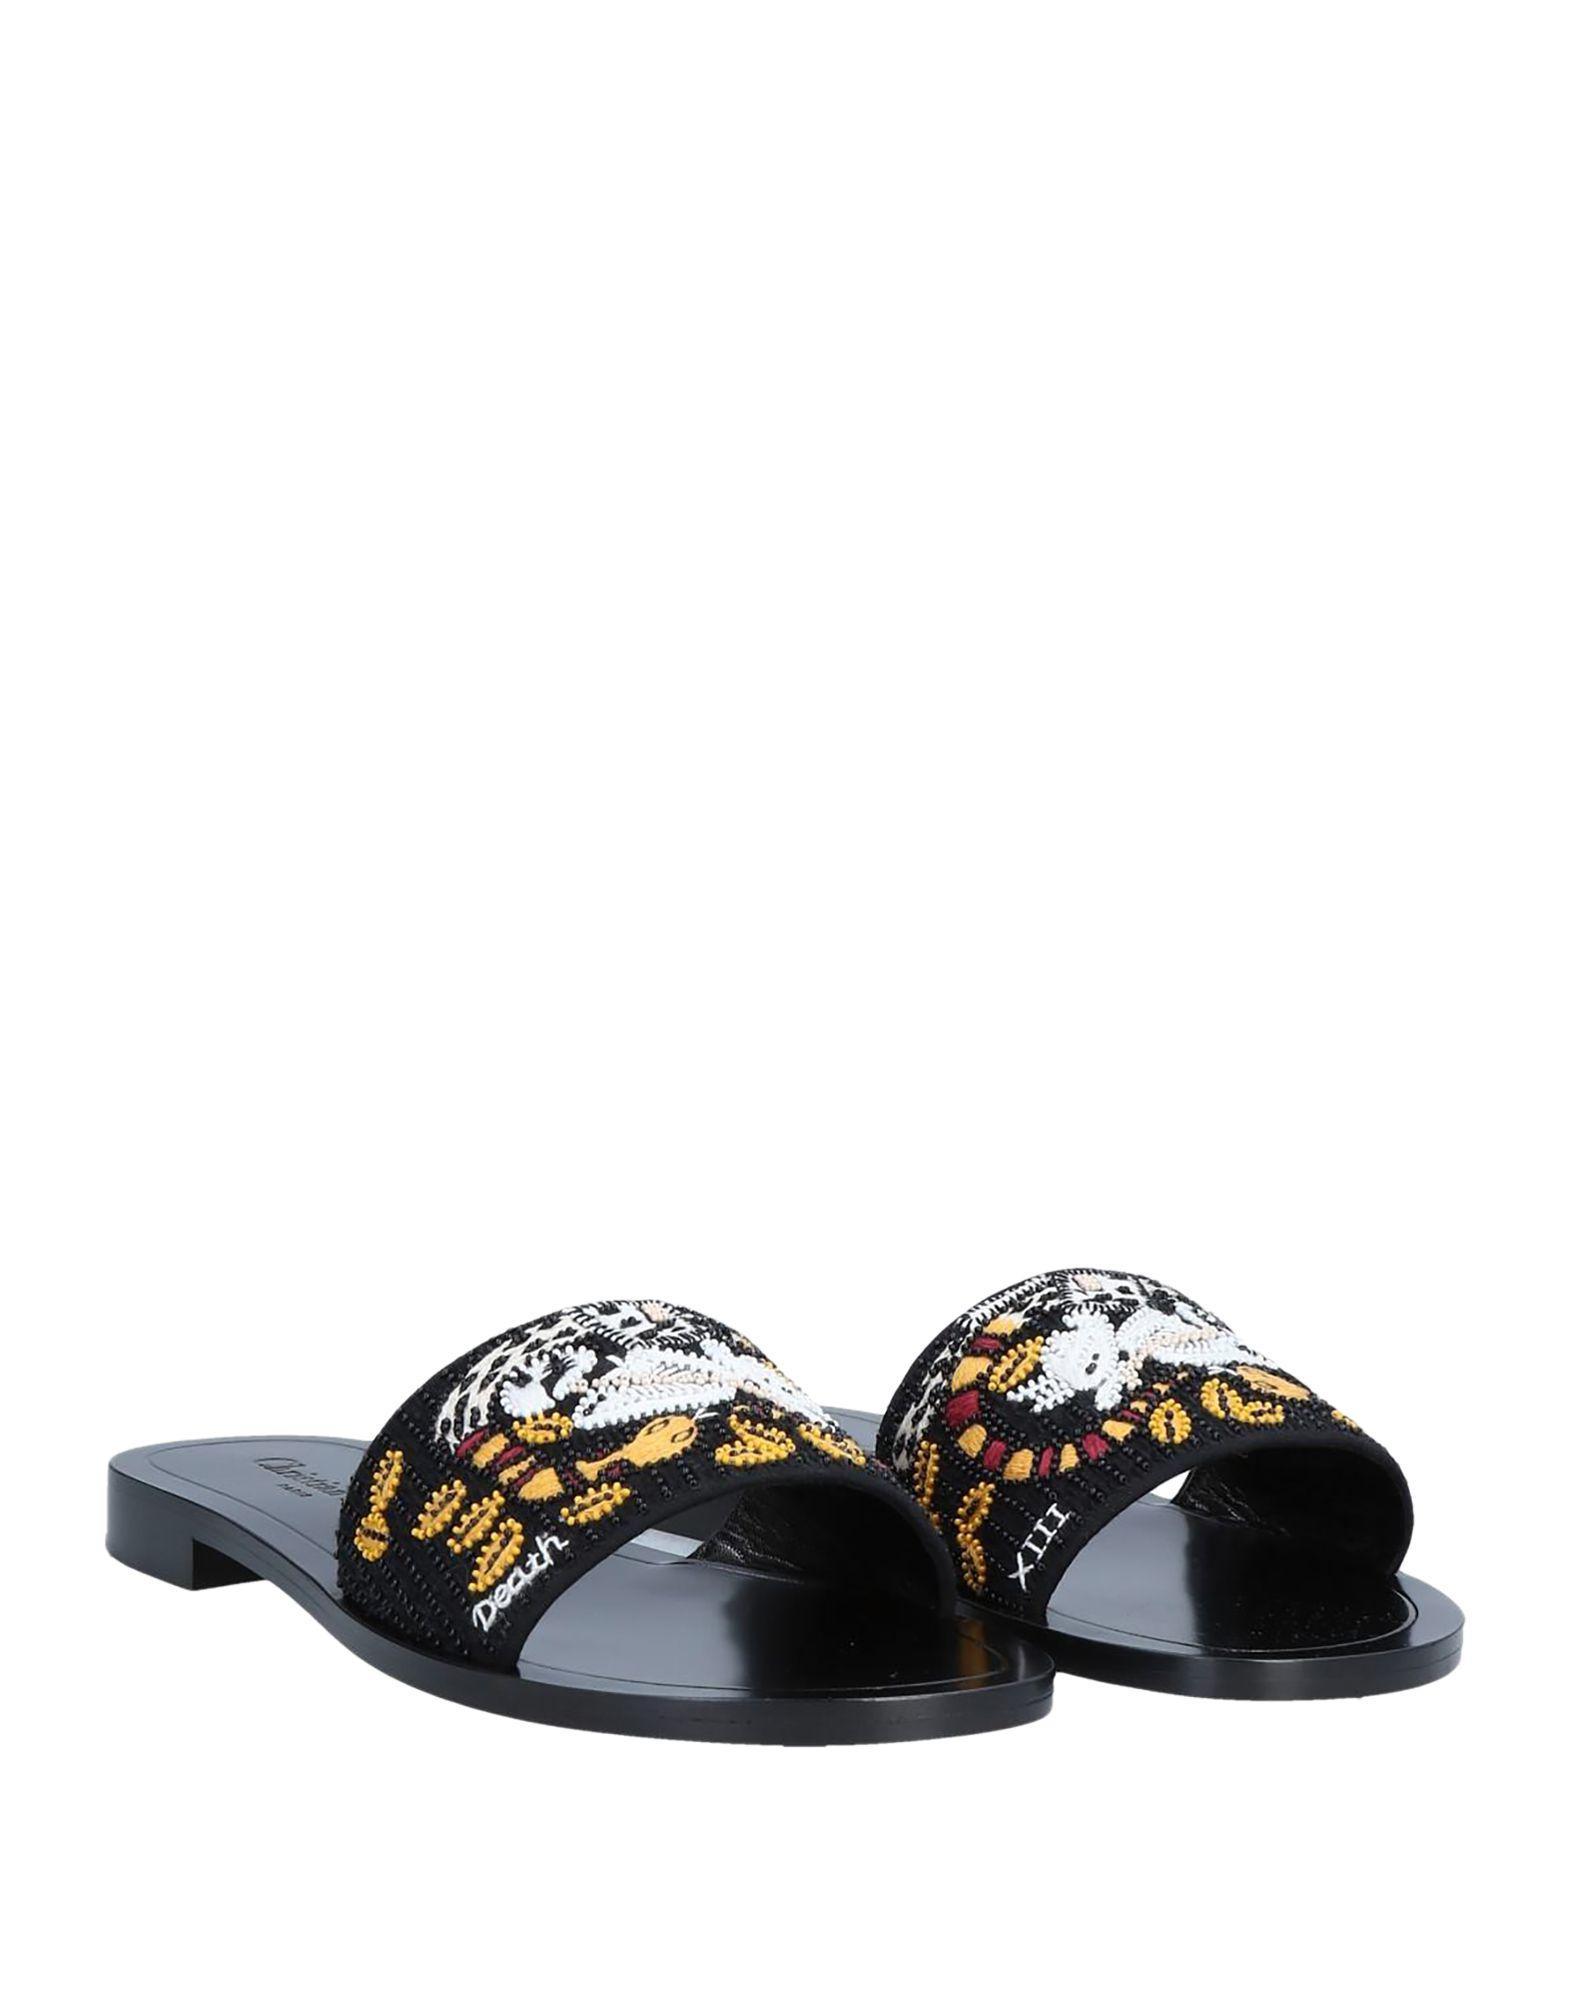 3b9a1539e3f Dior - Black Sandals - Lyst. View fullscreen